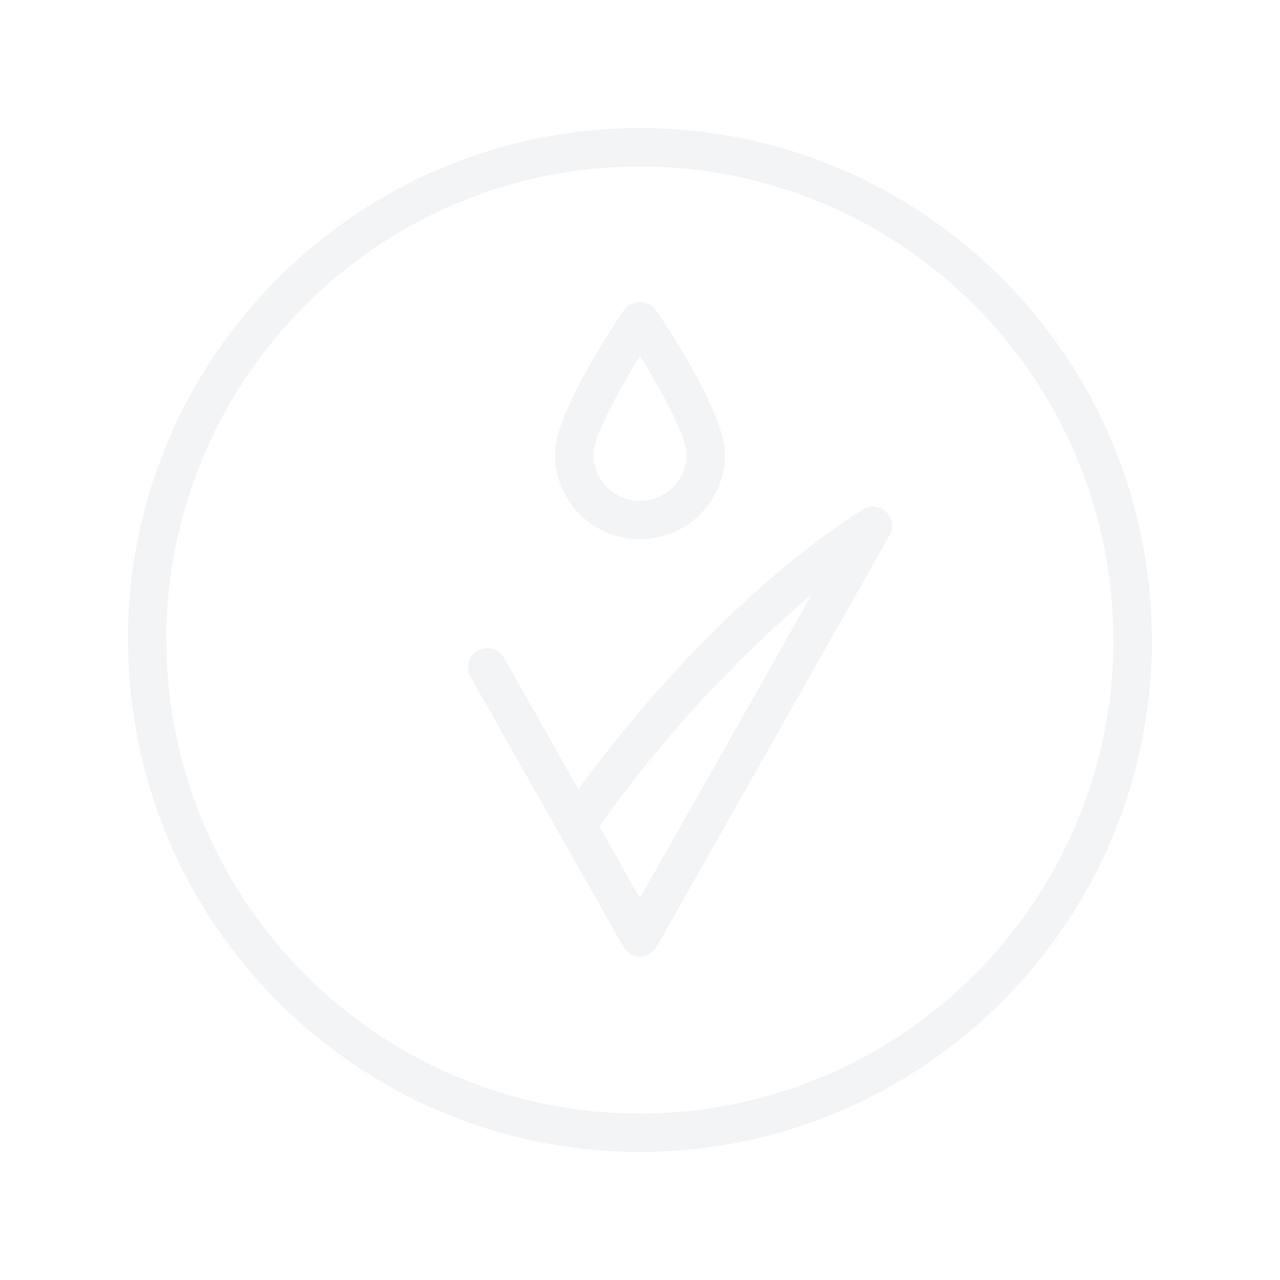 Natura Siberica Oblepikha Shampoo (Normal/ Dry Hair) 400ml